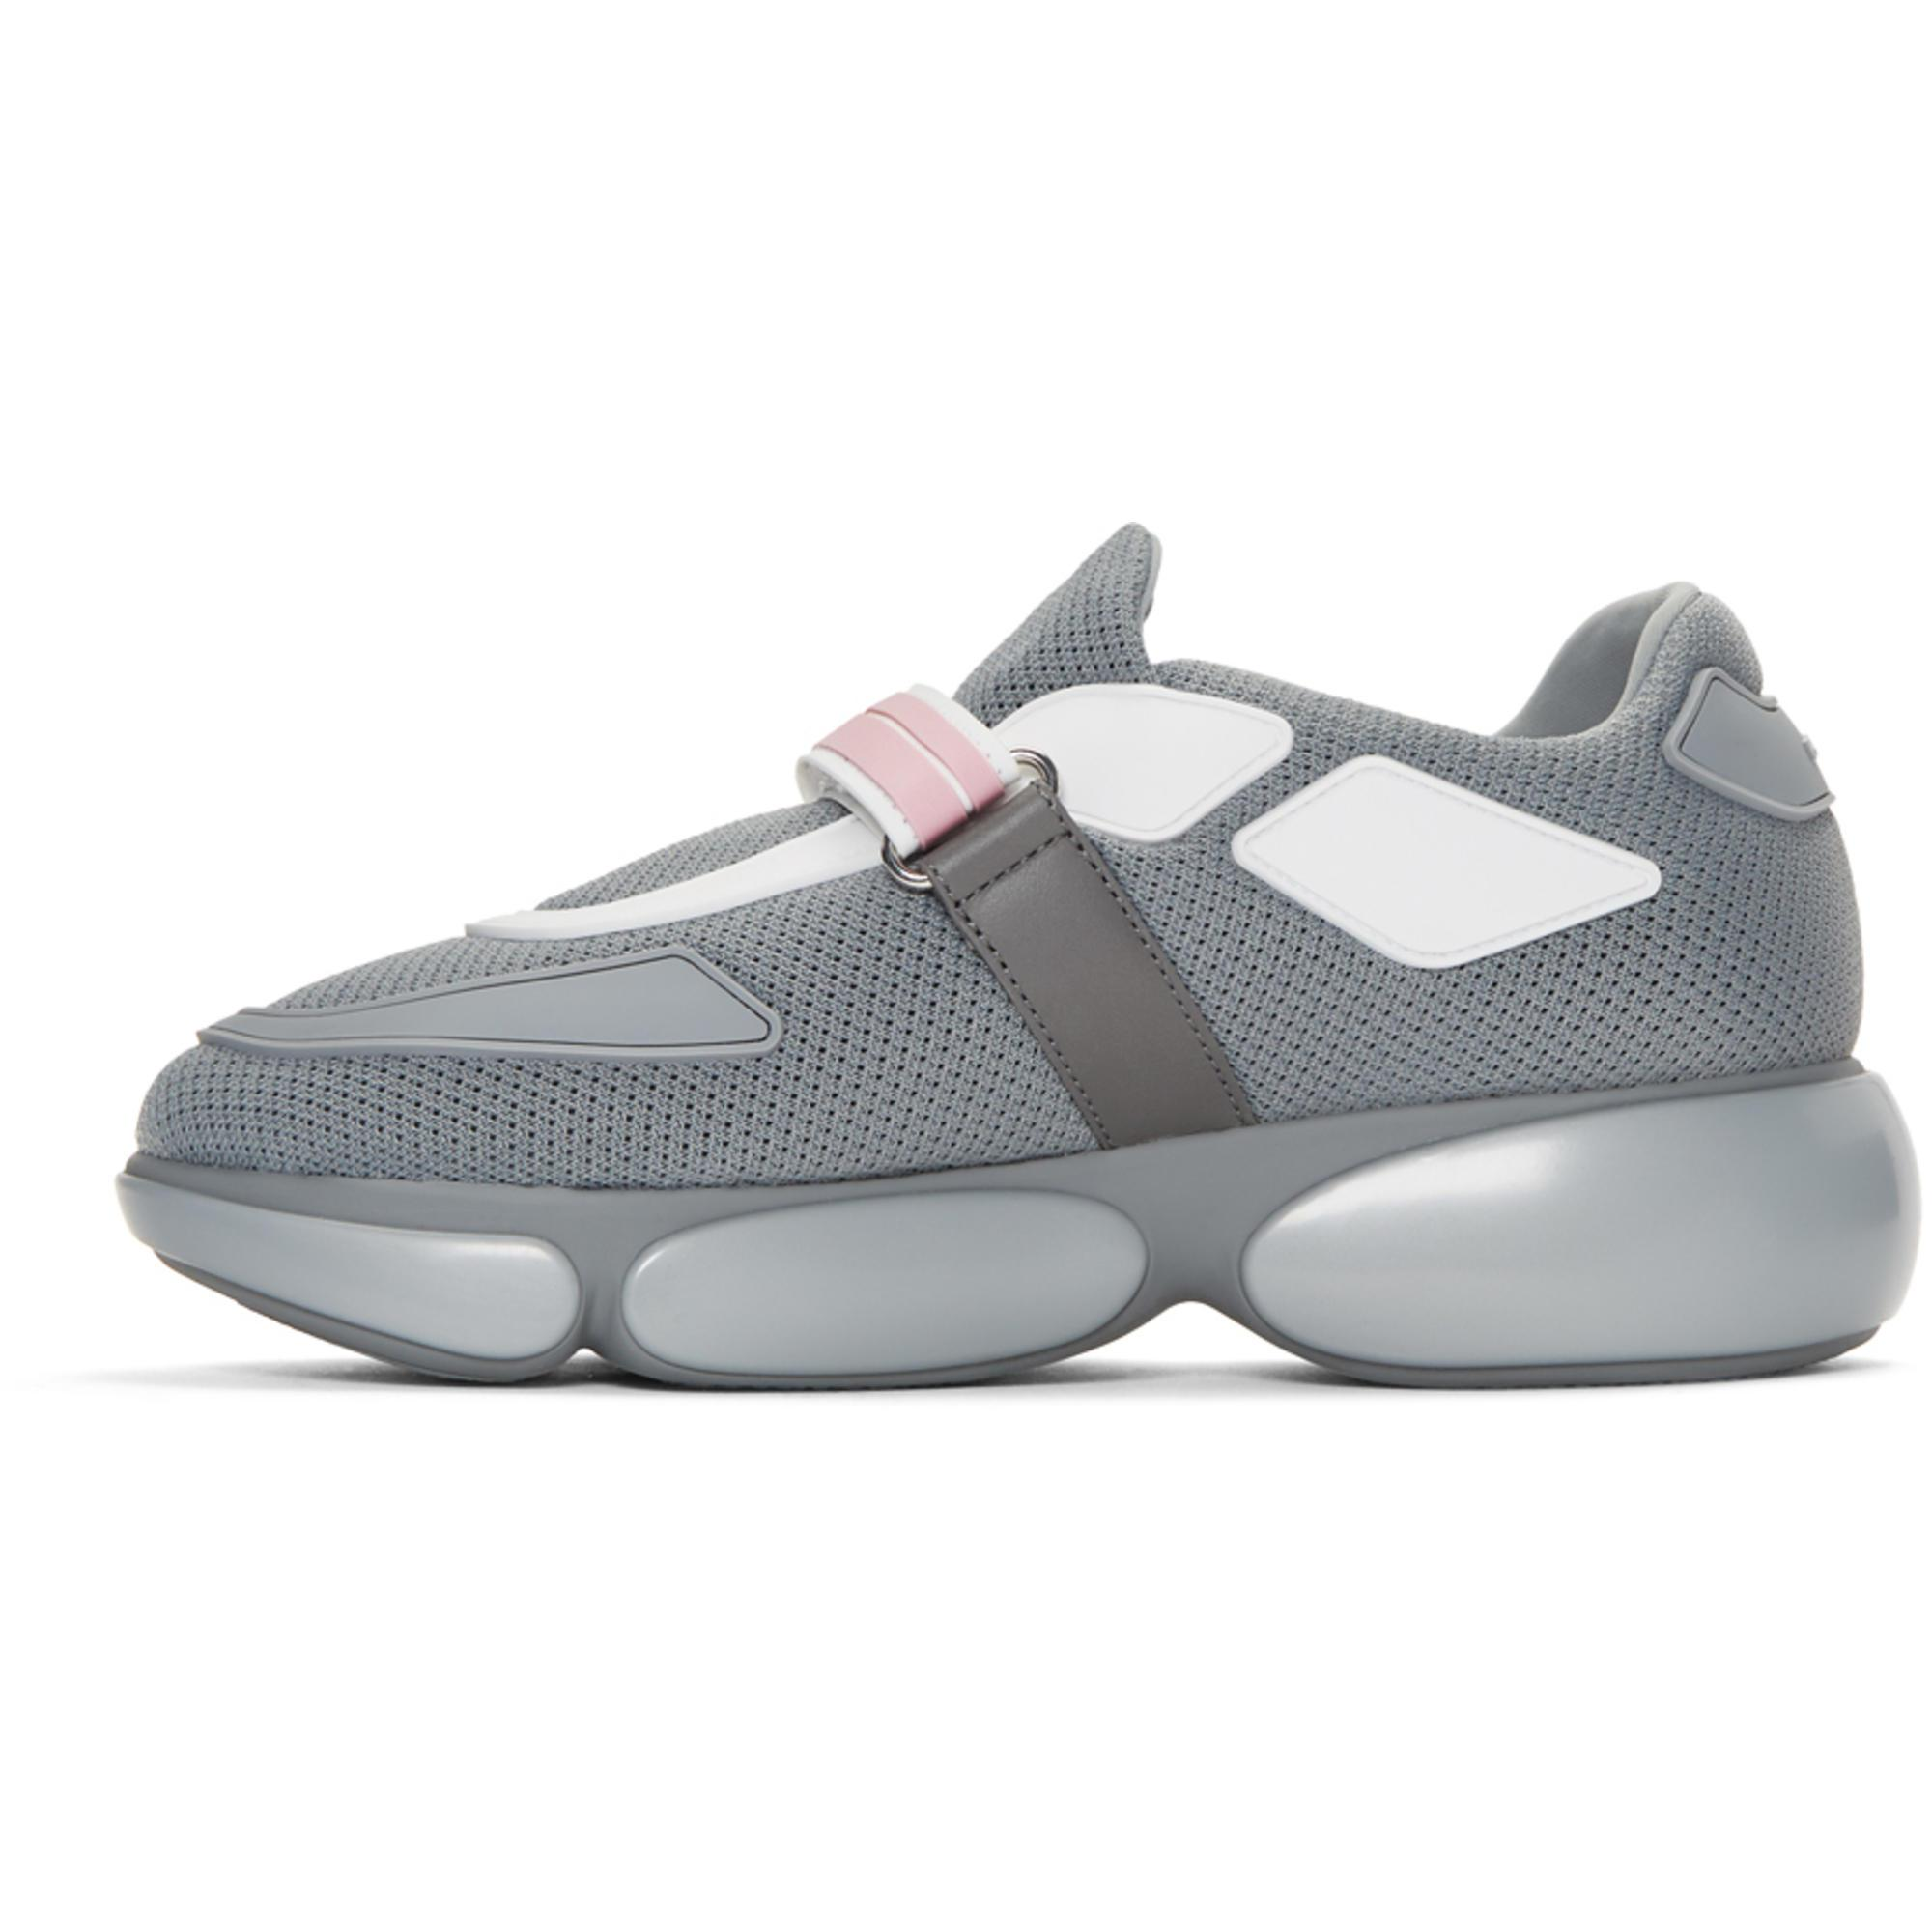 Prada Rubber Grey Cloudbust Sneakers in Grey for Men